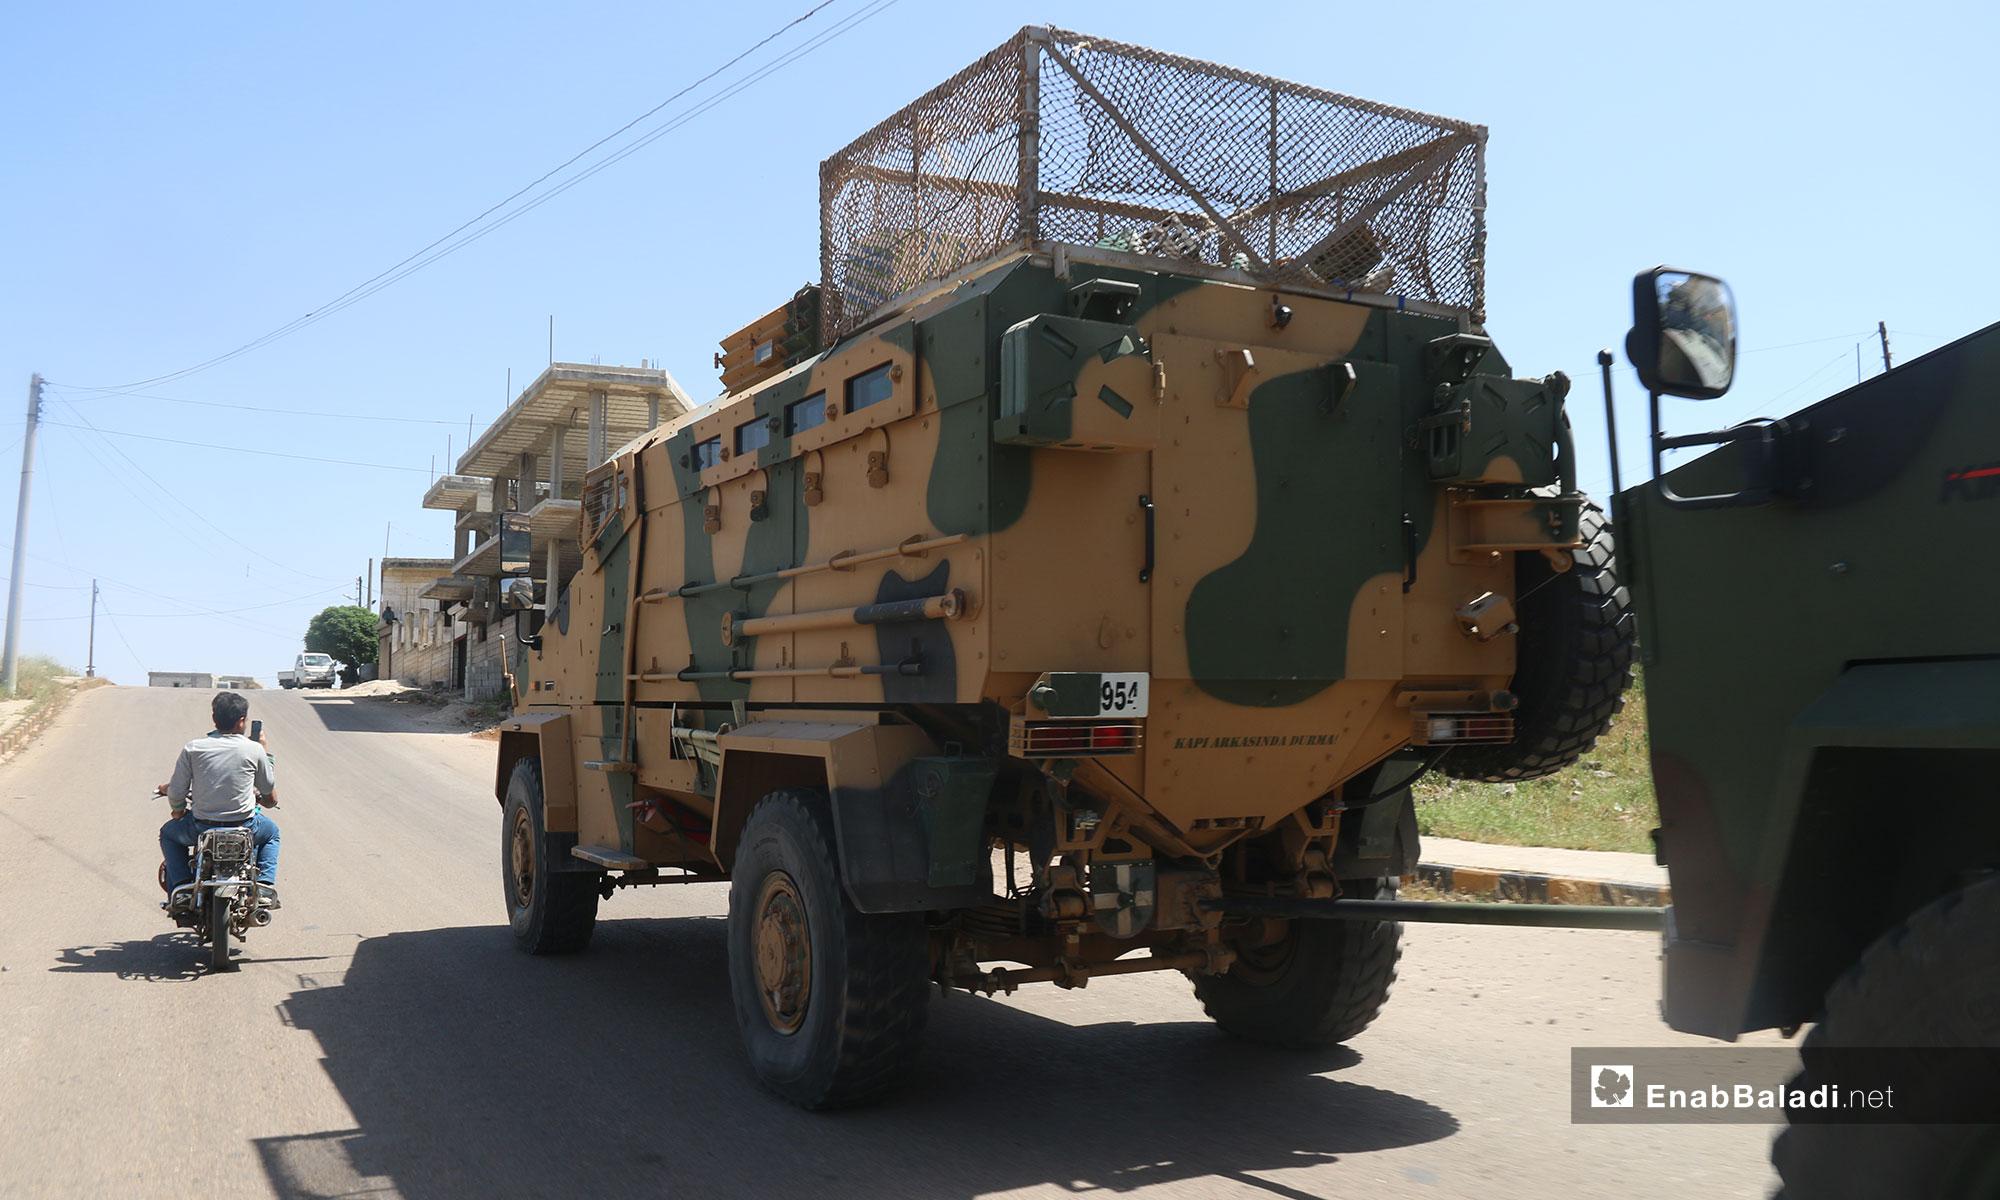 Turkish military convoy enters rural Idlib, heading towards al-Ghab Plain in rural Hama – May 17, 2019 (Enab Baladi)